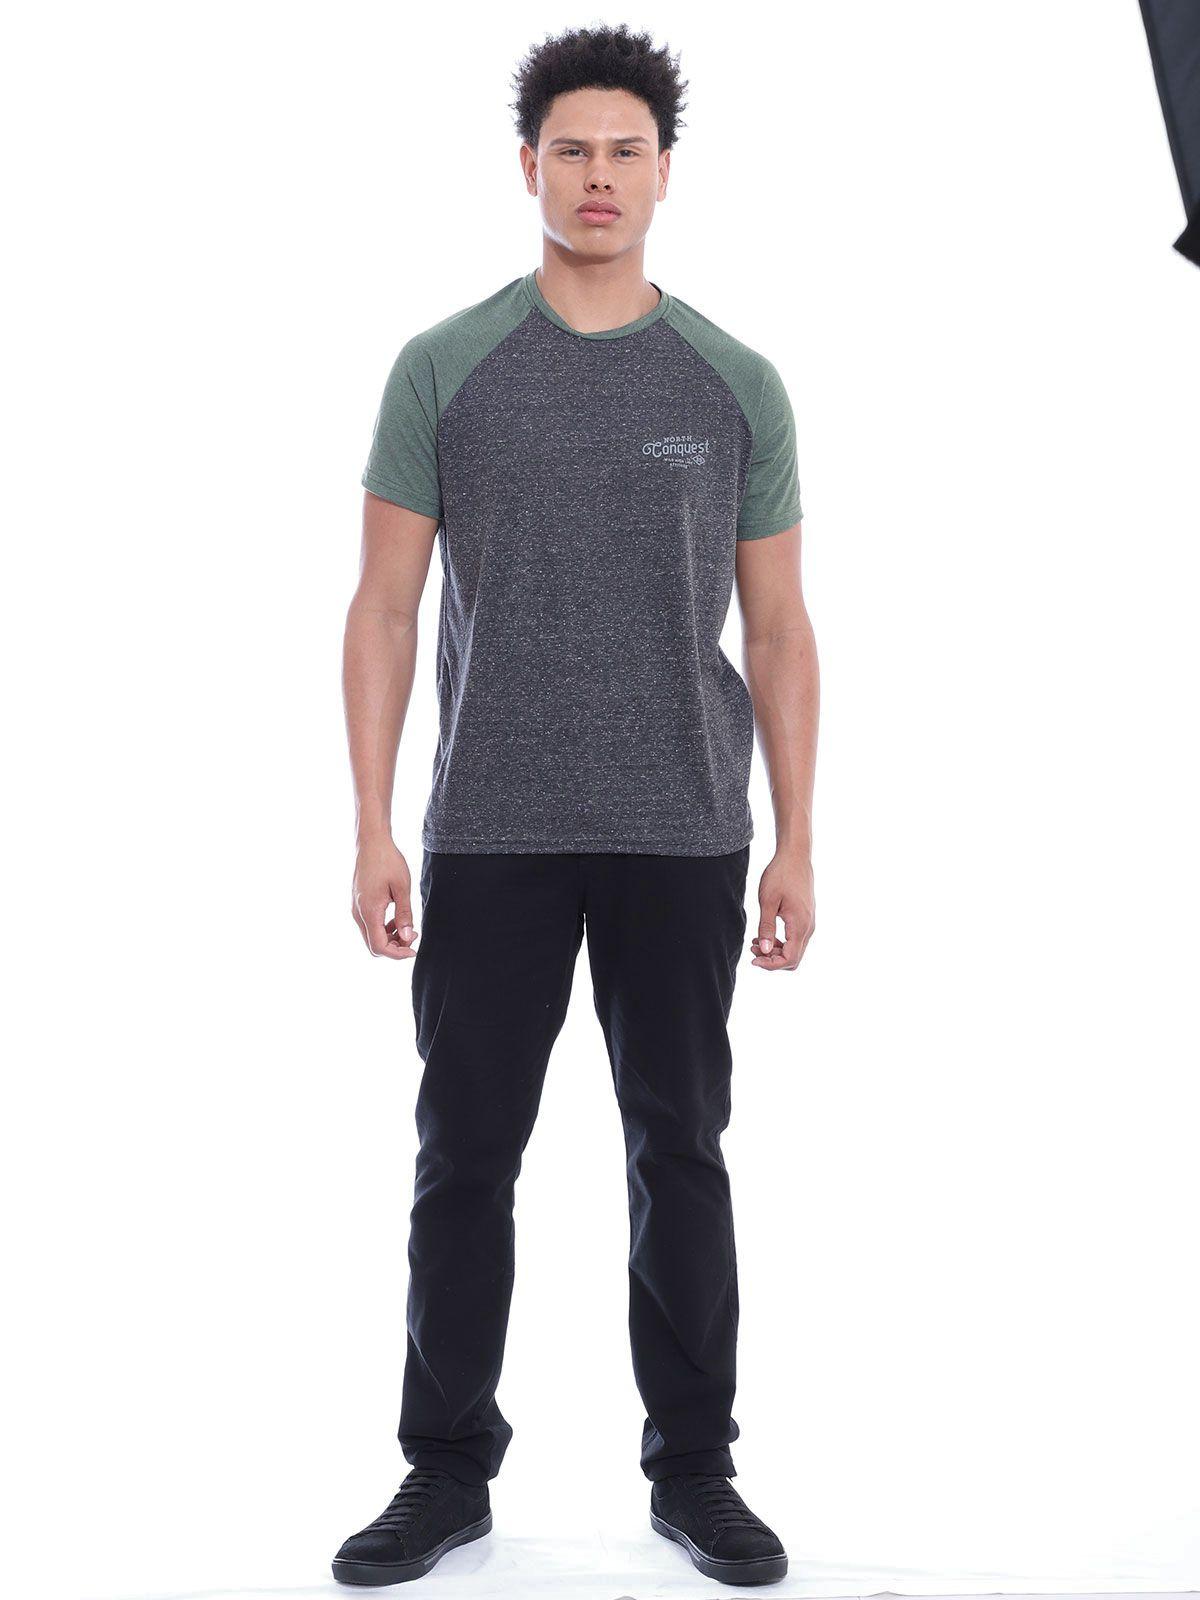 Camiseta Masculina Manga Ragla Gola Careca Botone Preto